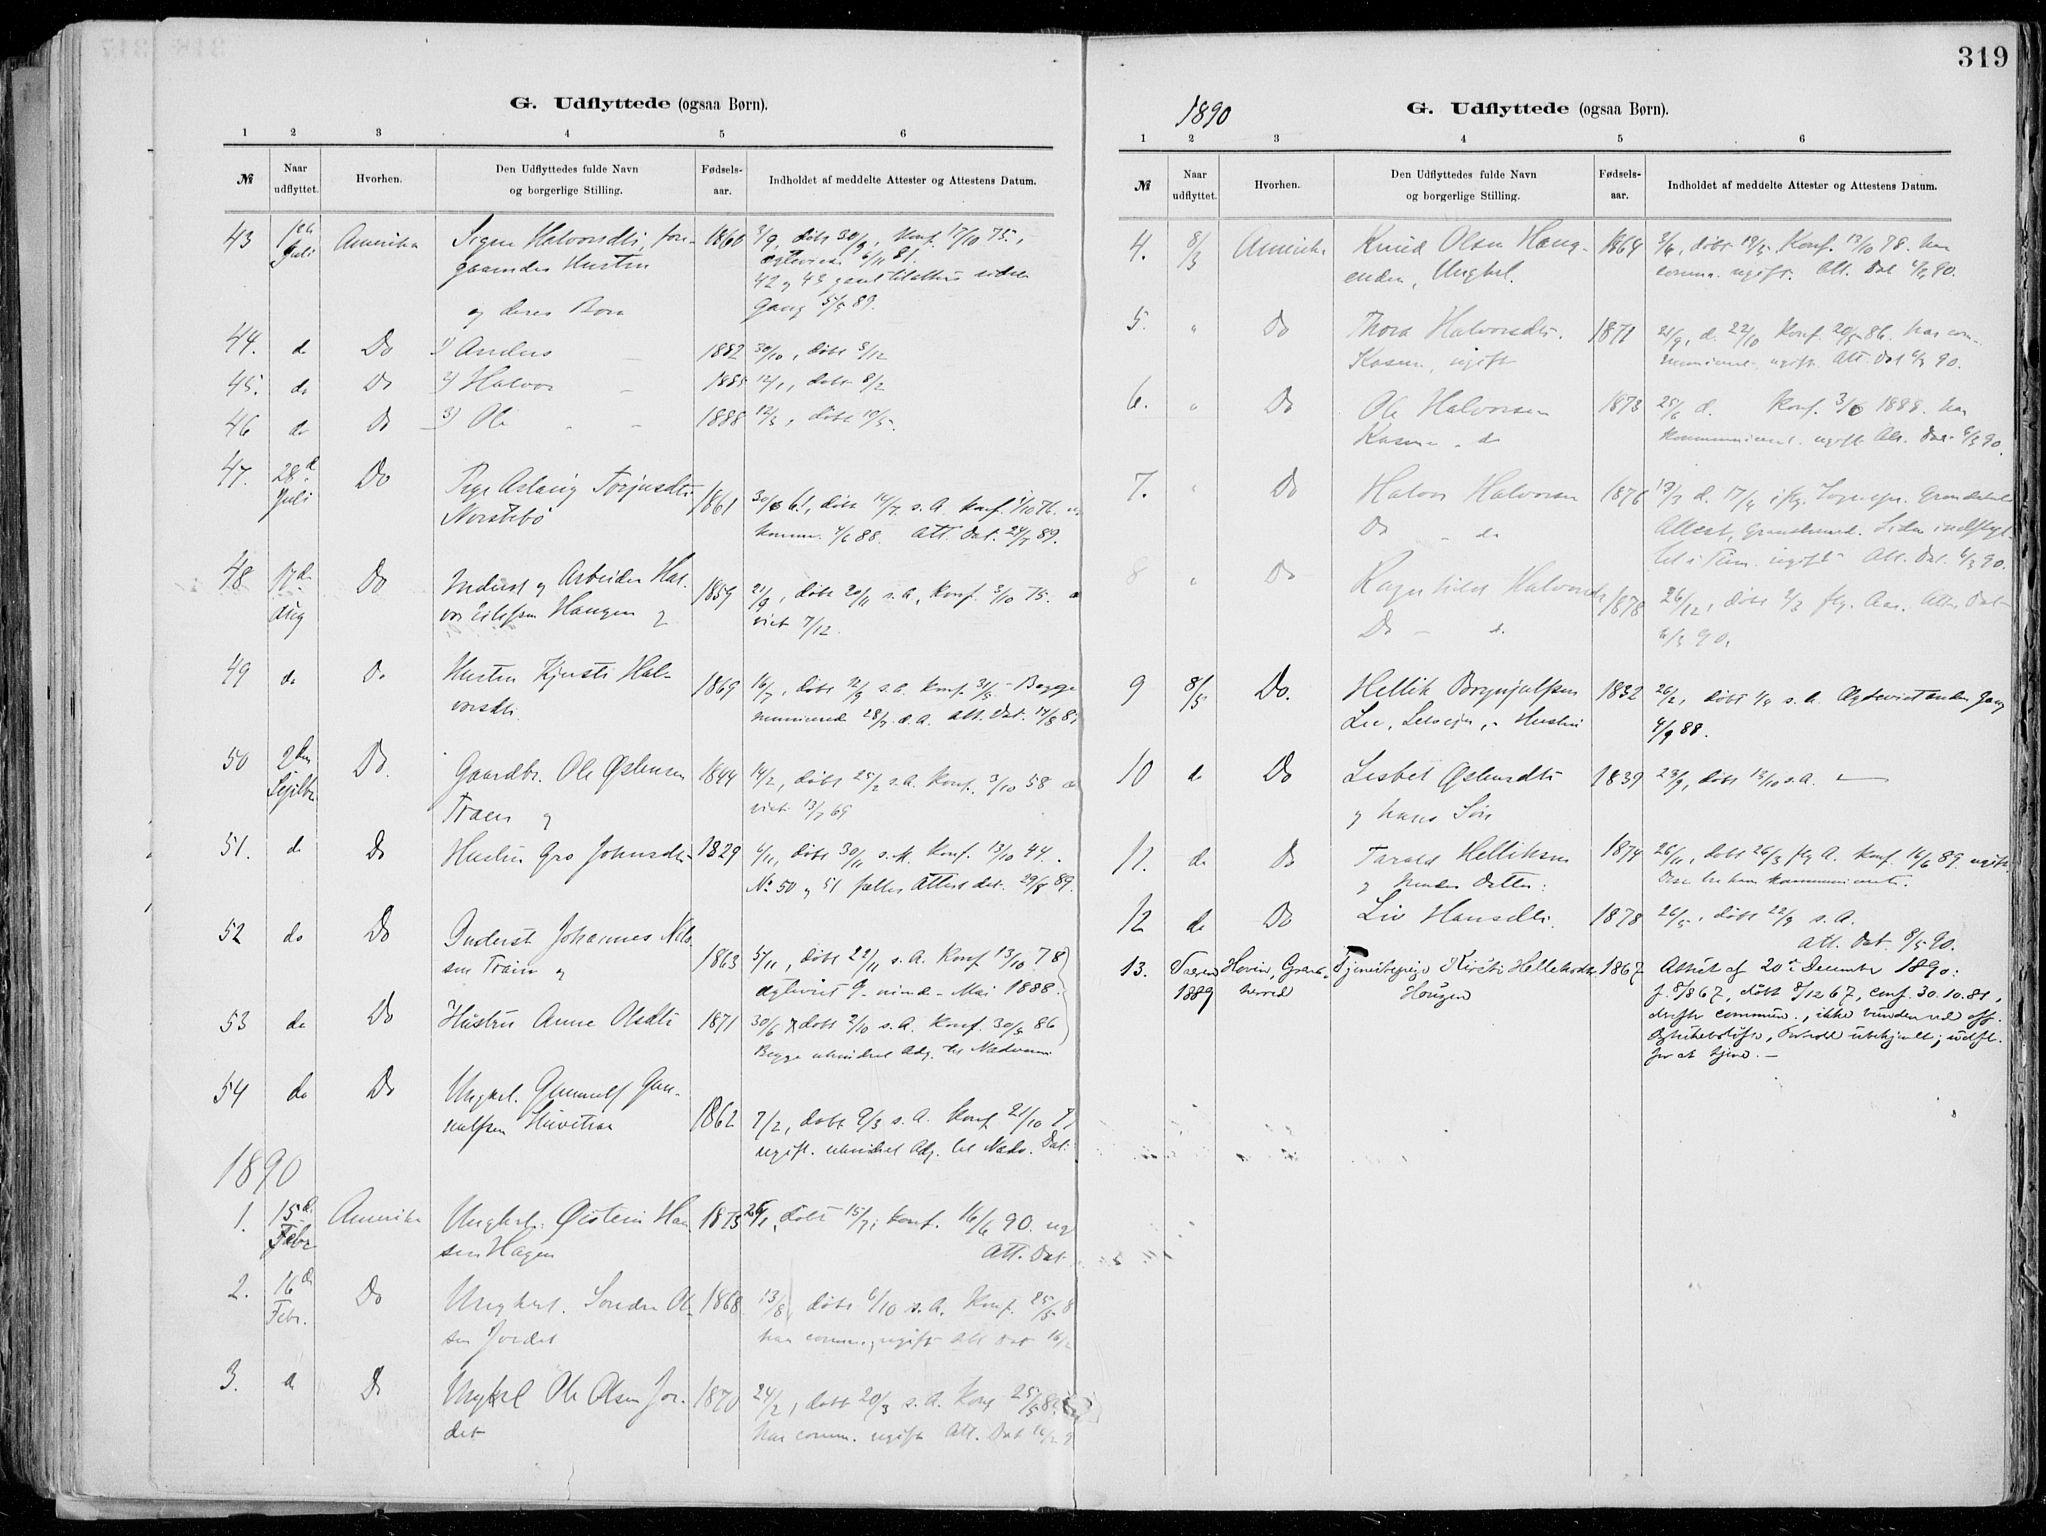 SAKO, Tinn kirkebøker, F/Fa/L0007: Ministerialbok nr. I 7, 1878-1922, s. 319